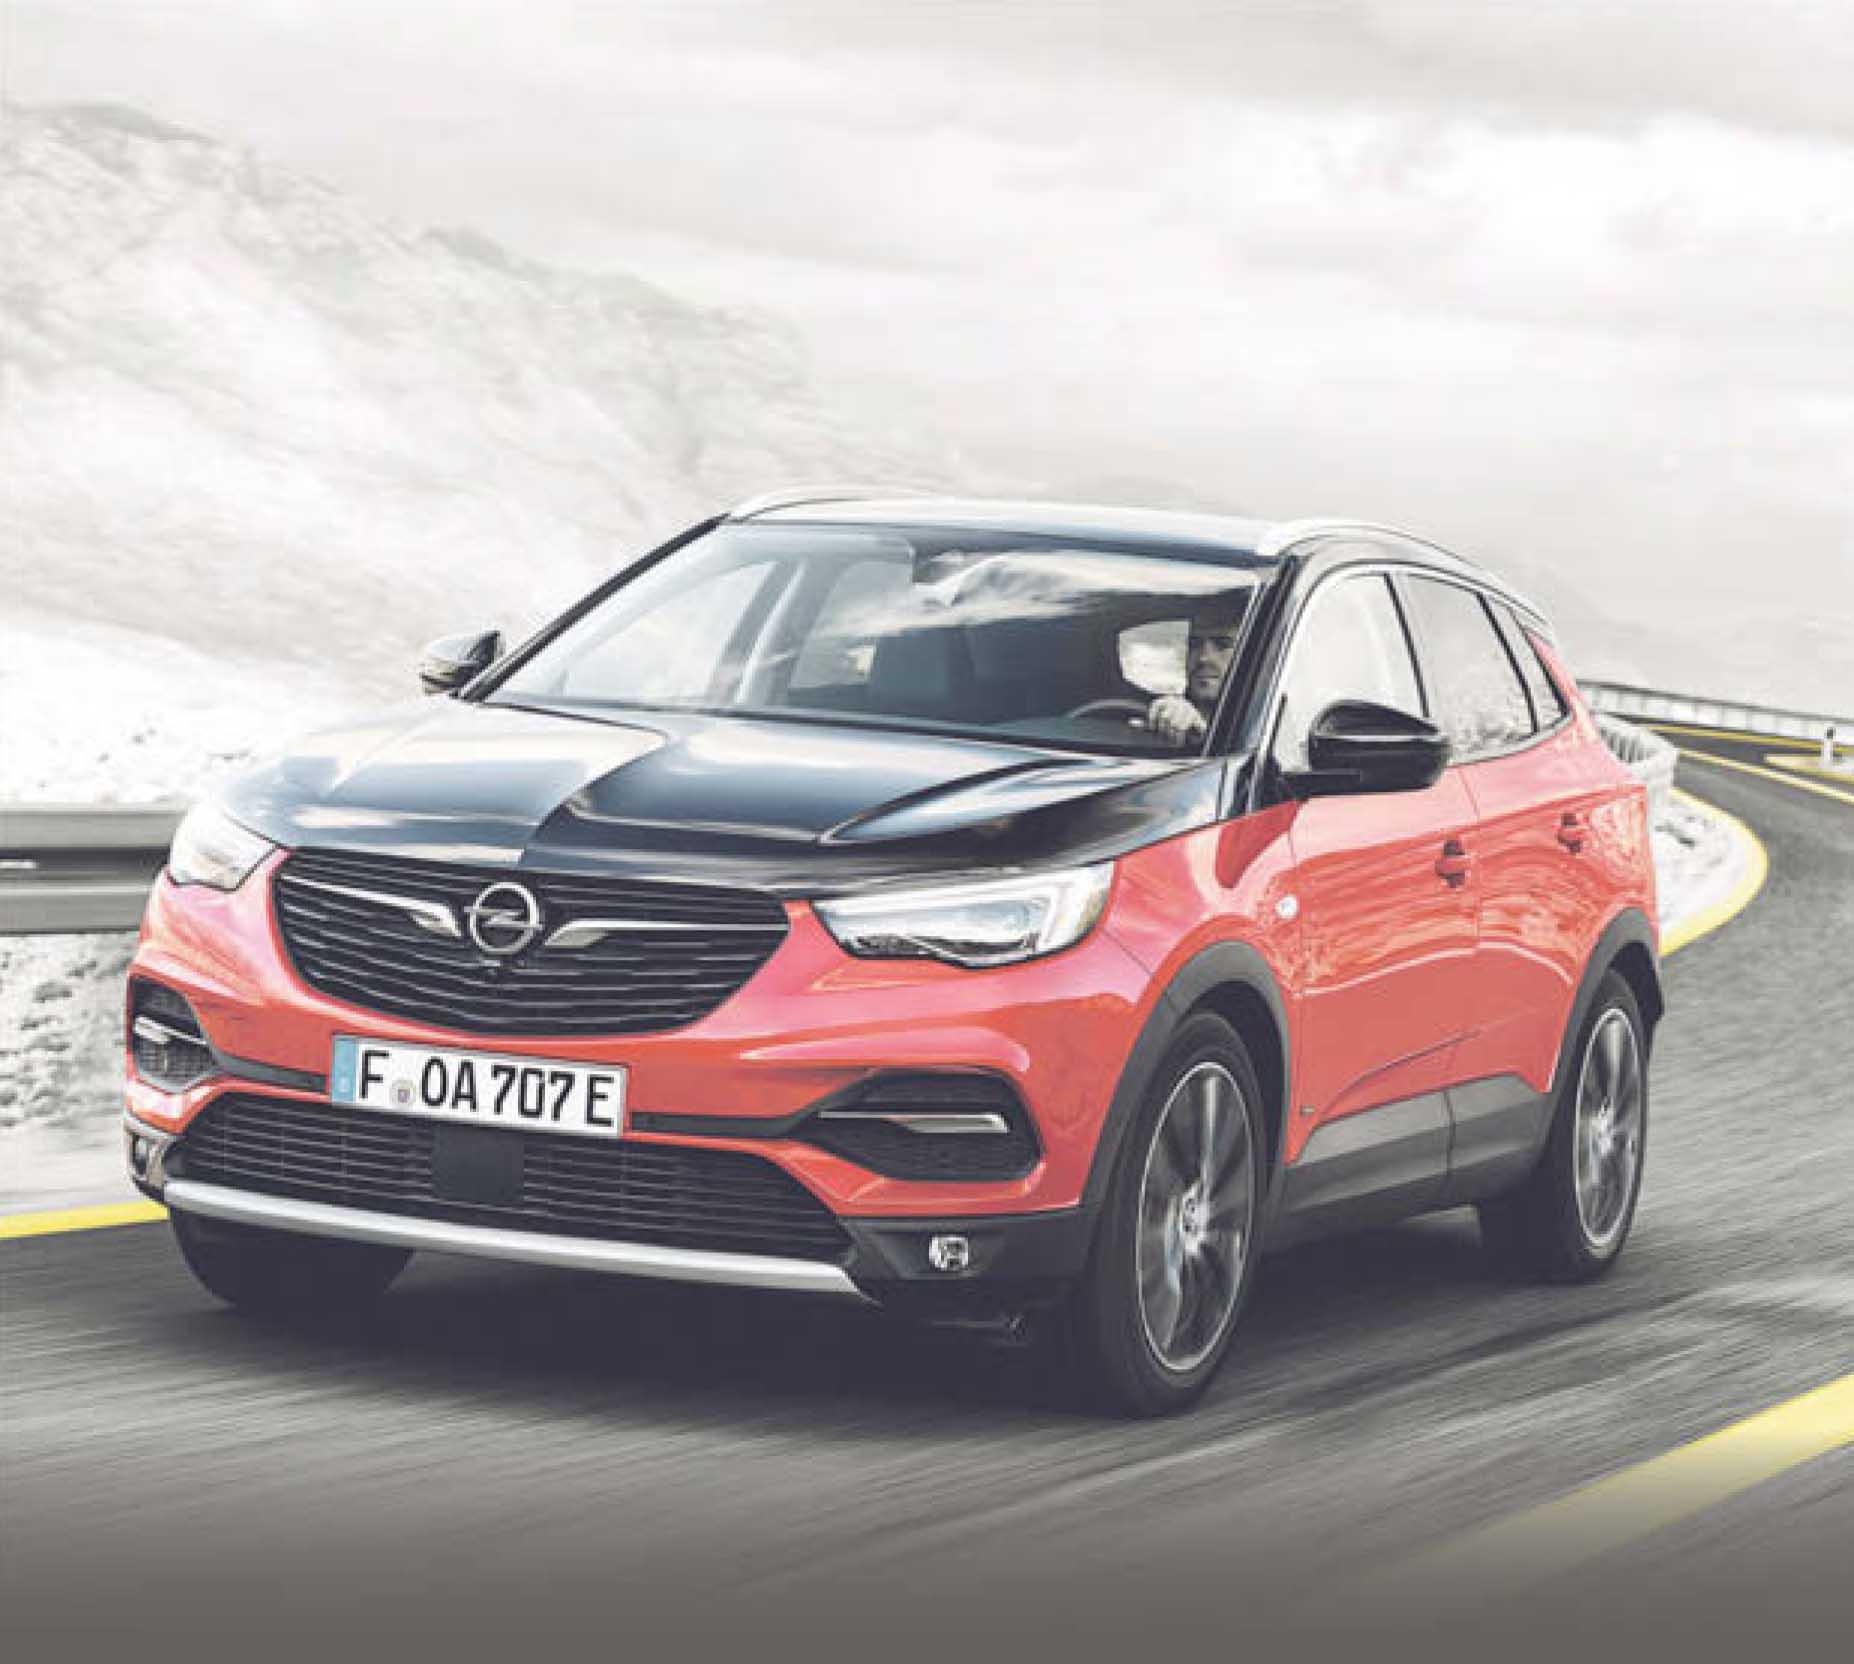 Fotos: Opel Automobile GmbH